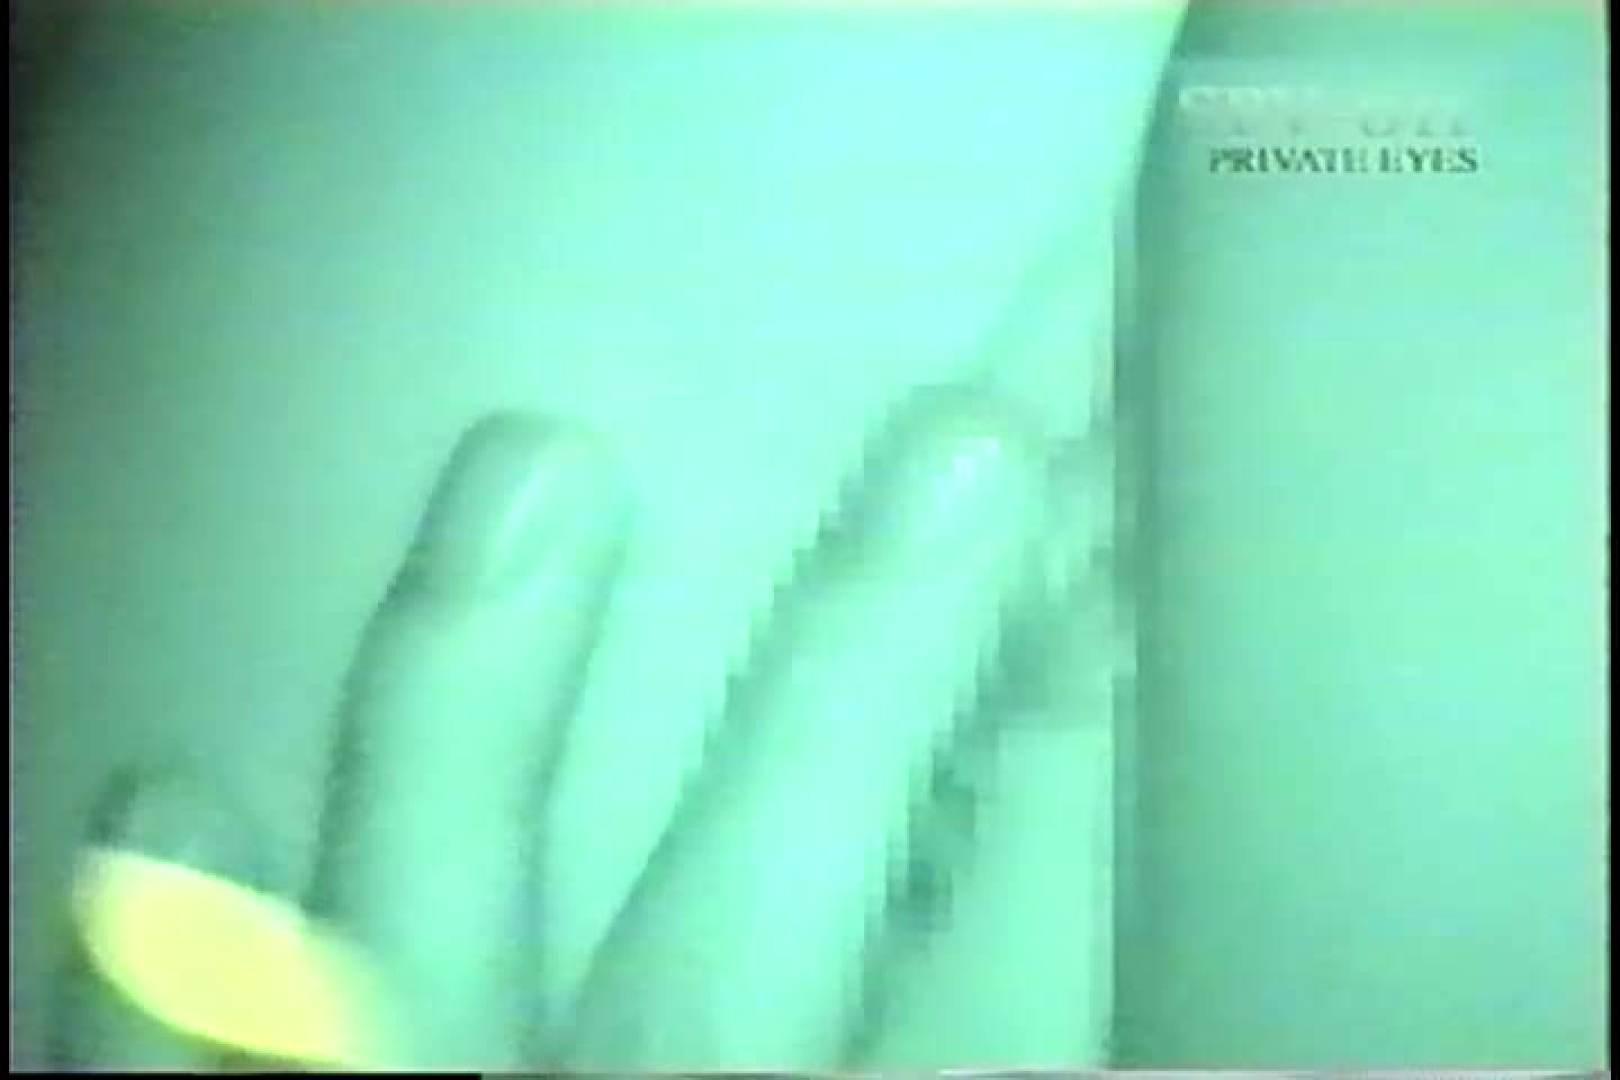 高画質版!SPD-011 盗撮 カーセックス黙示録 (VHS) 盗撮 濡れ場動画紹介 94連発 20